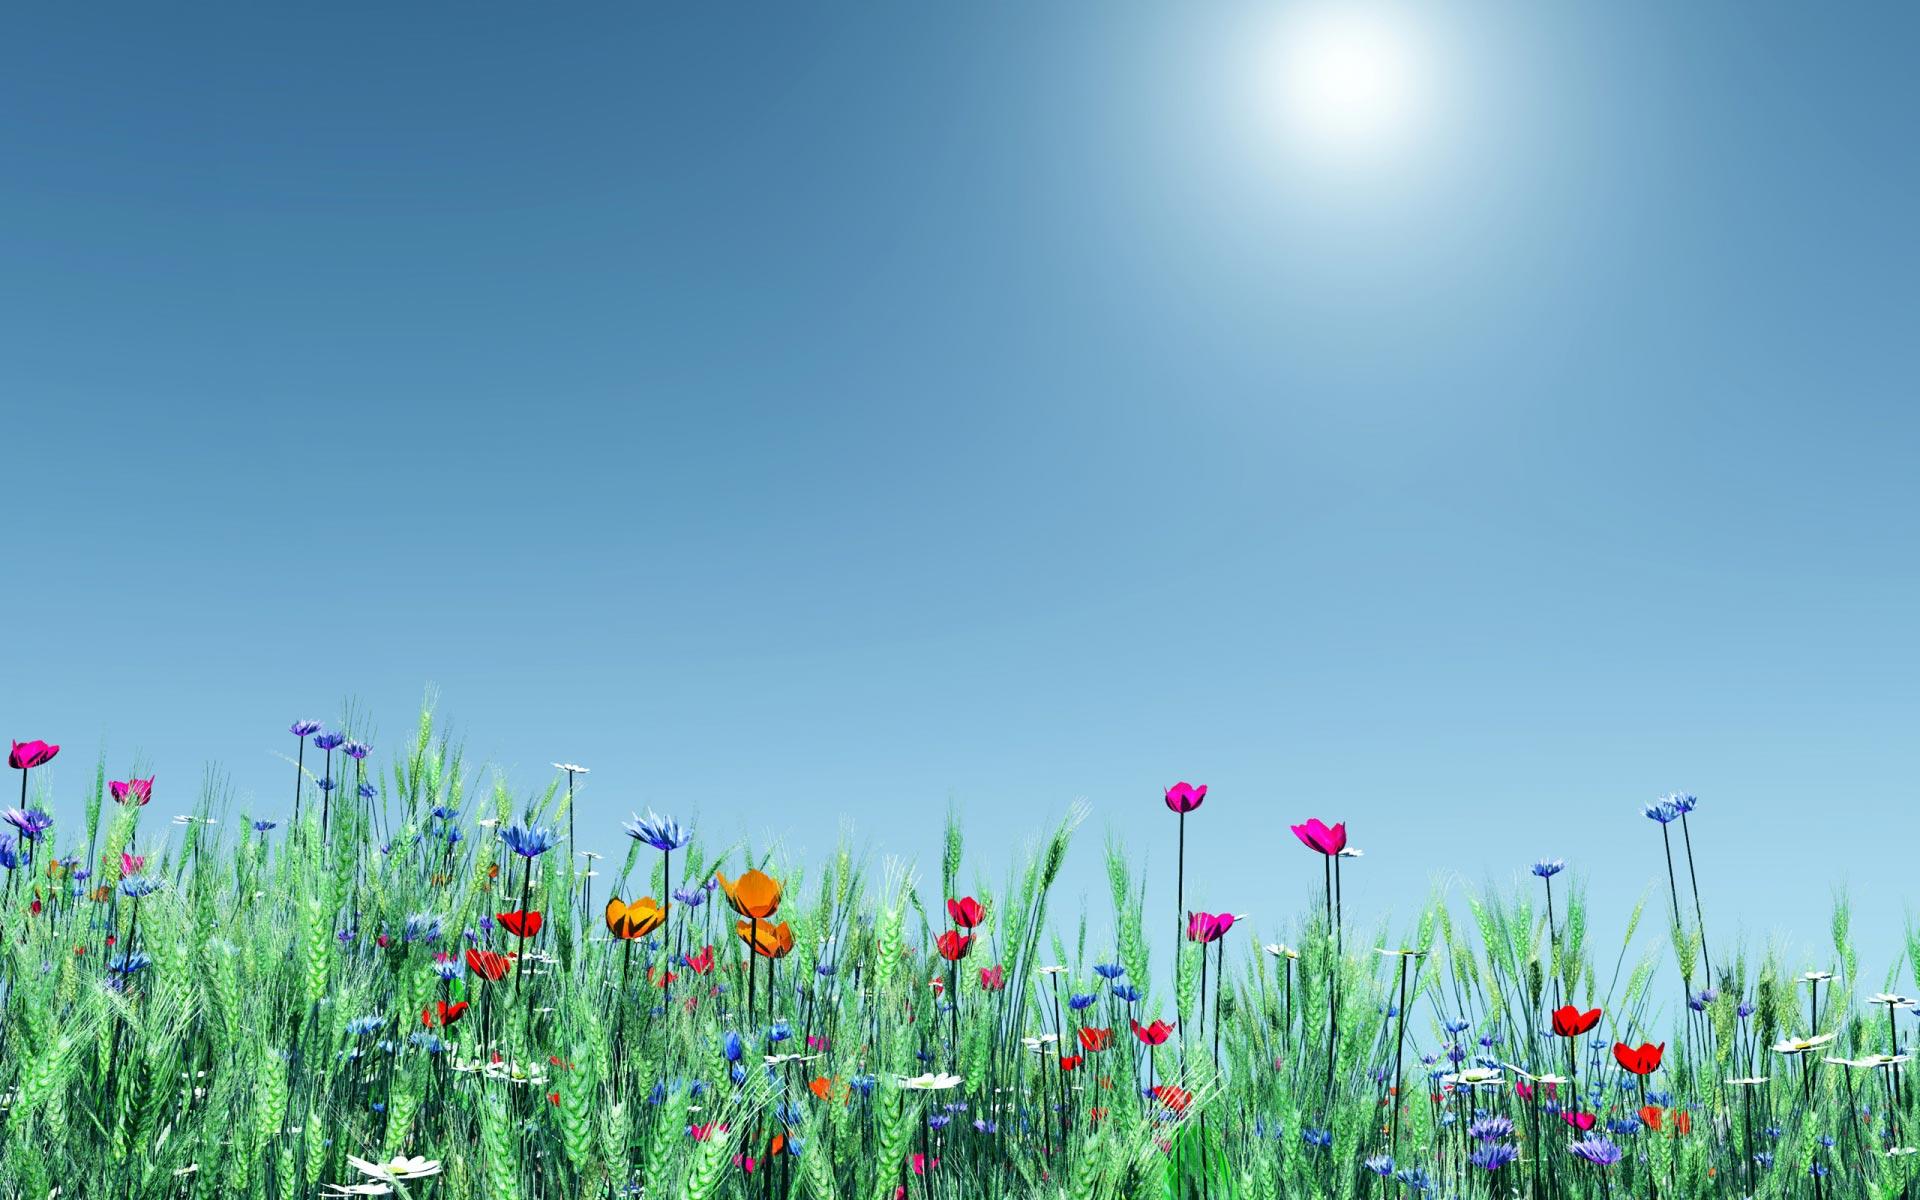 Spring Widescreen Wallpaper Sf Wallpaper